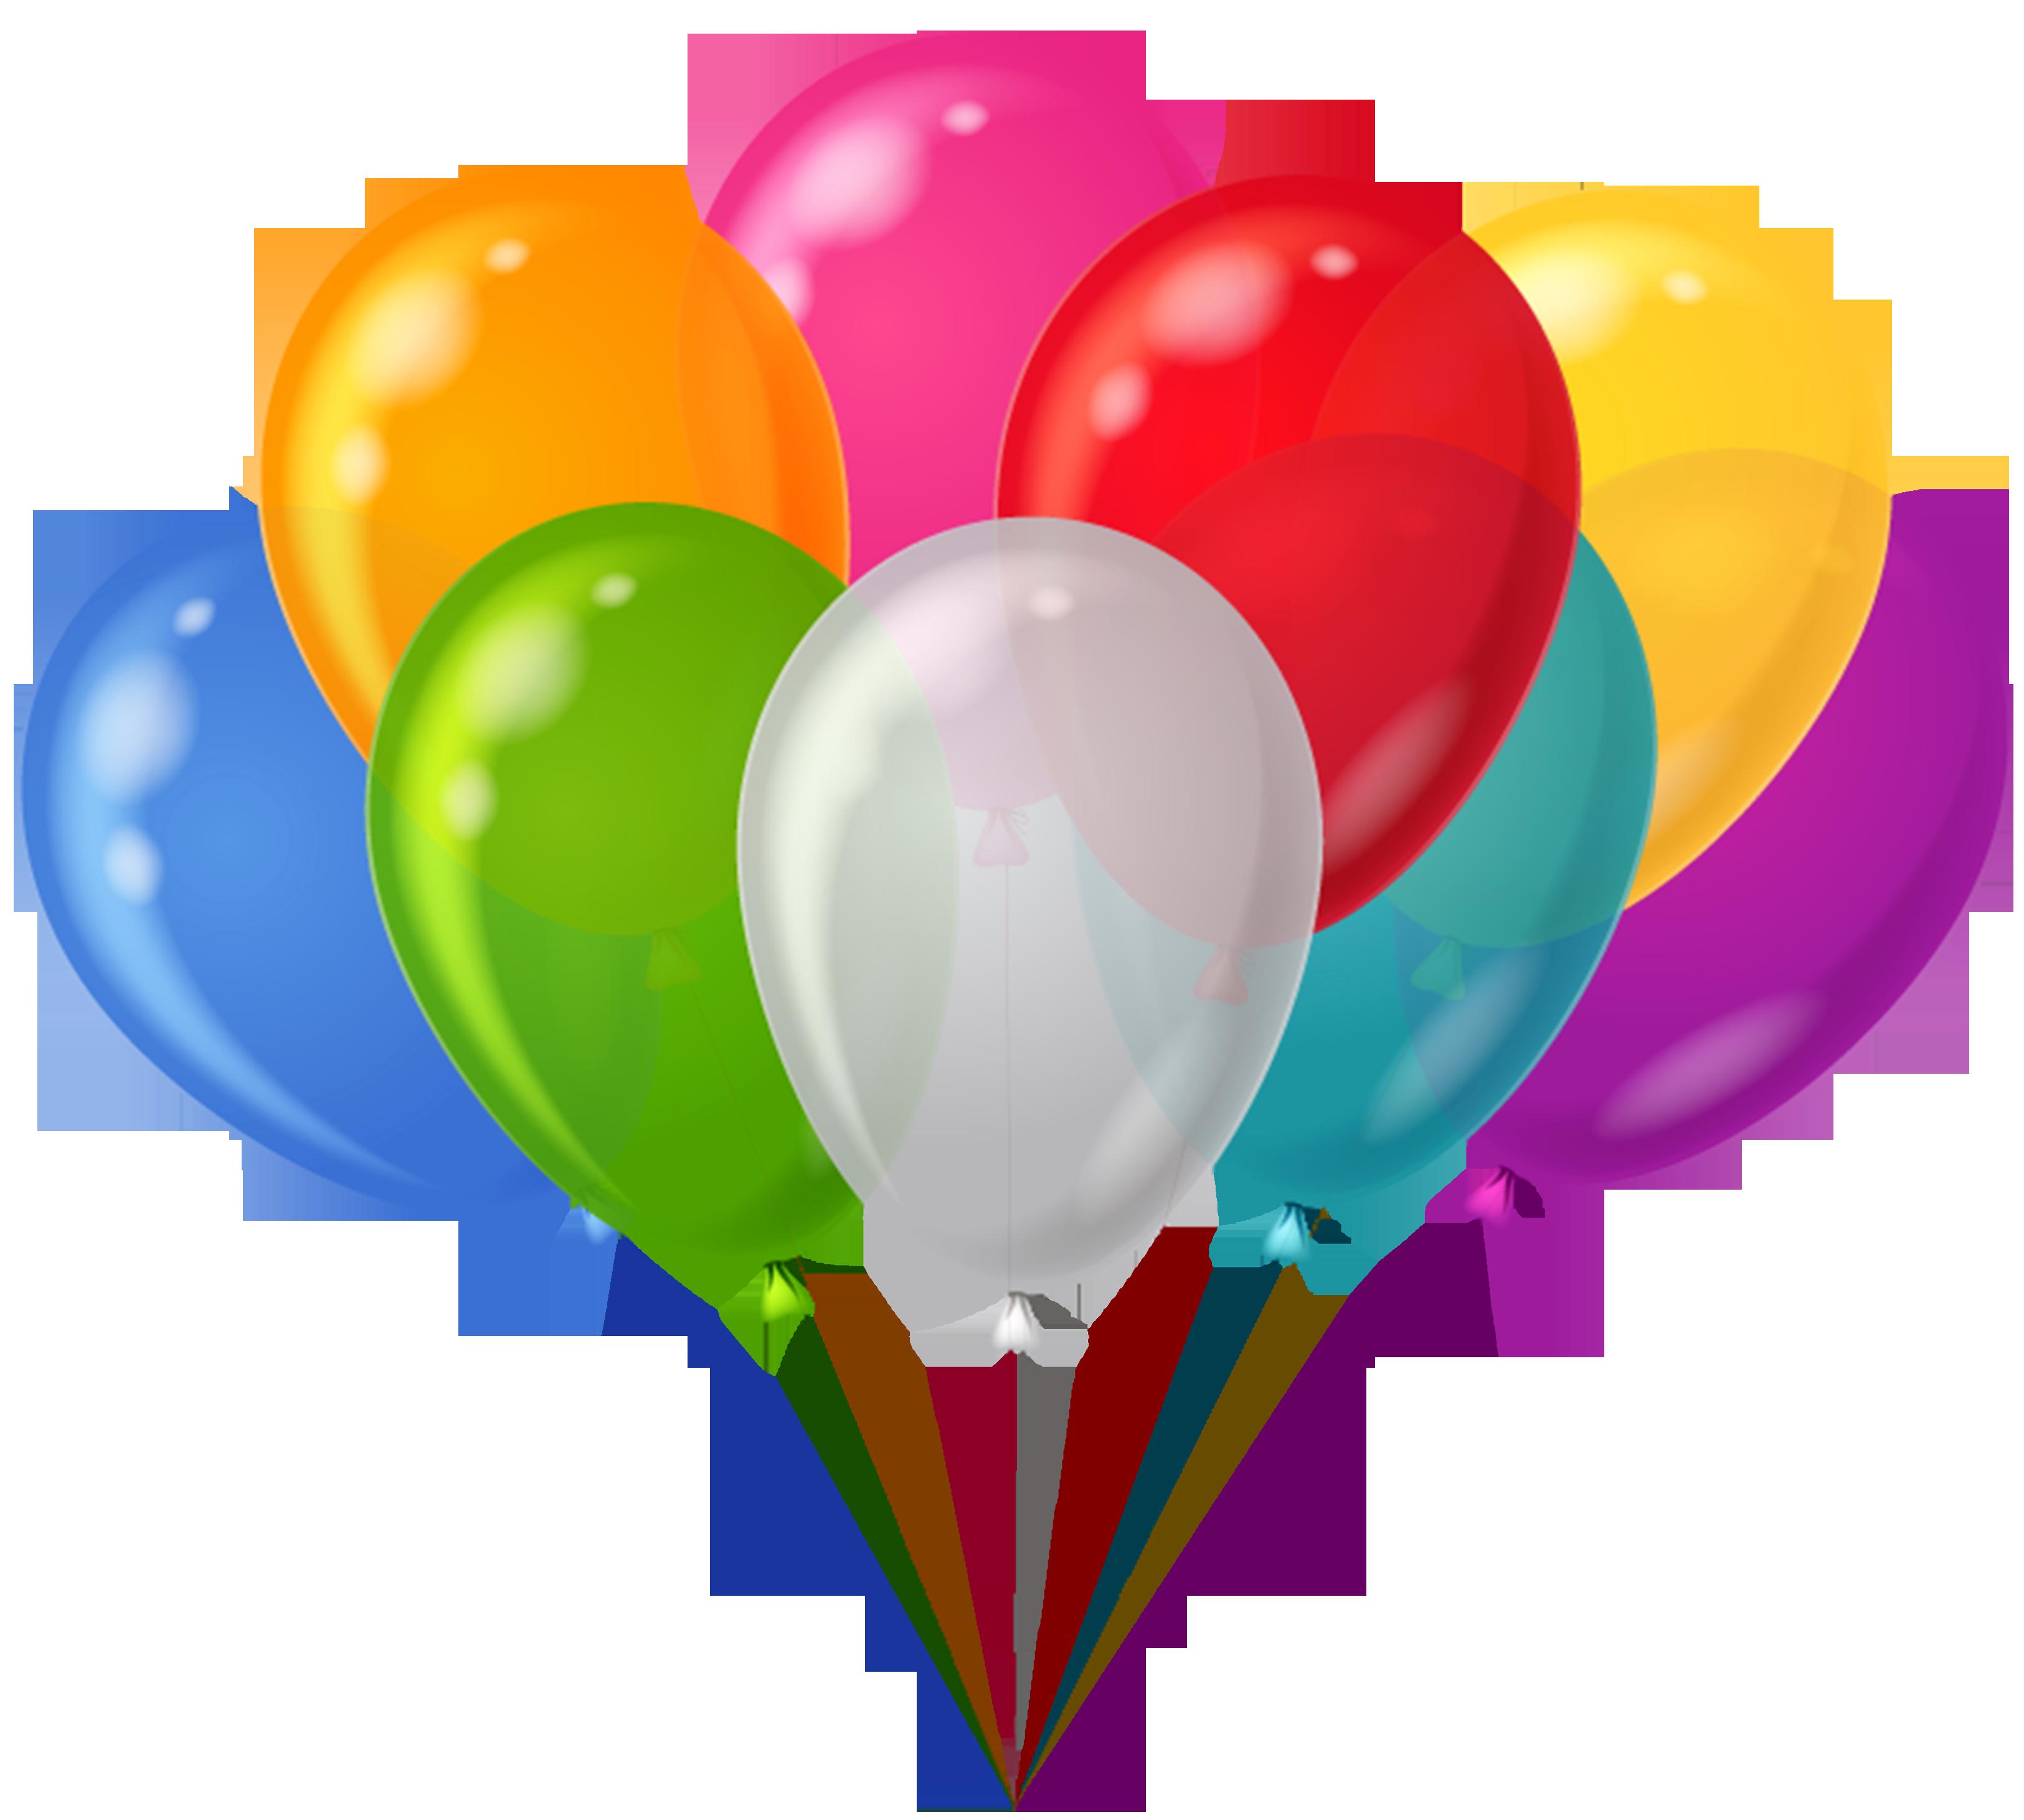 Ballons Clip Art-Ballons Clip Art-2